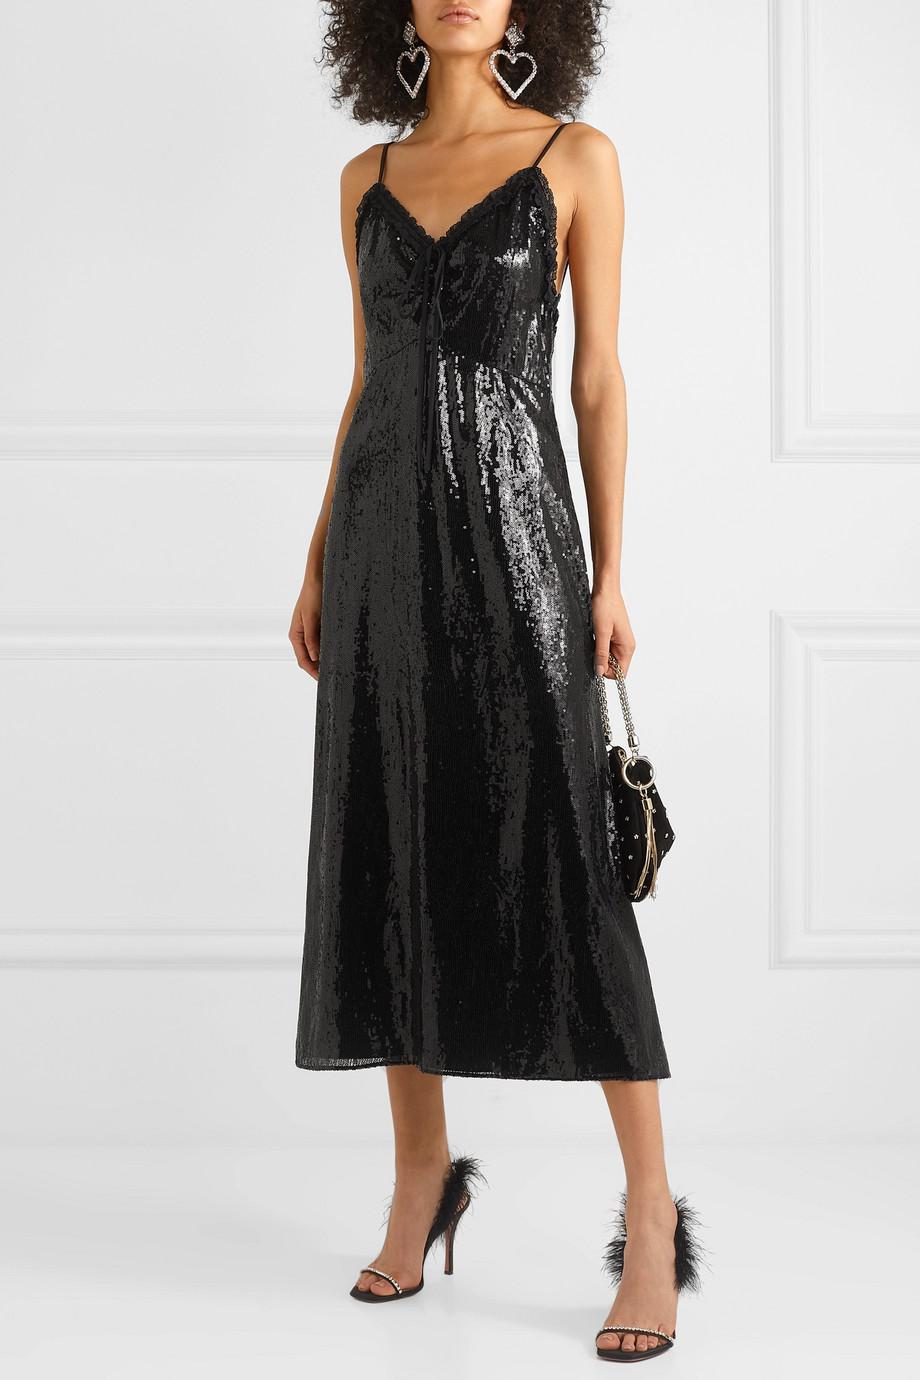 Miu Miu Open-back lace-trimmed sequined crepe midi dress